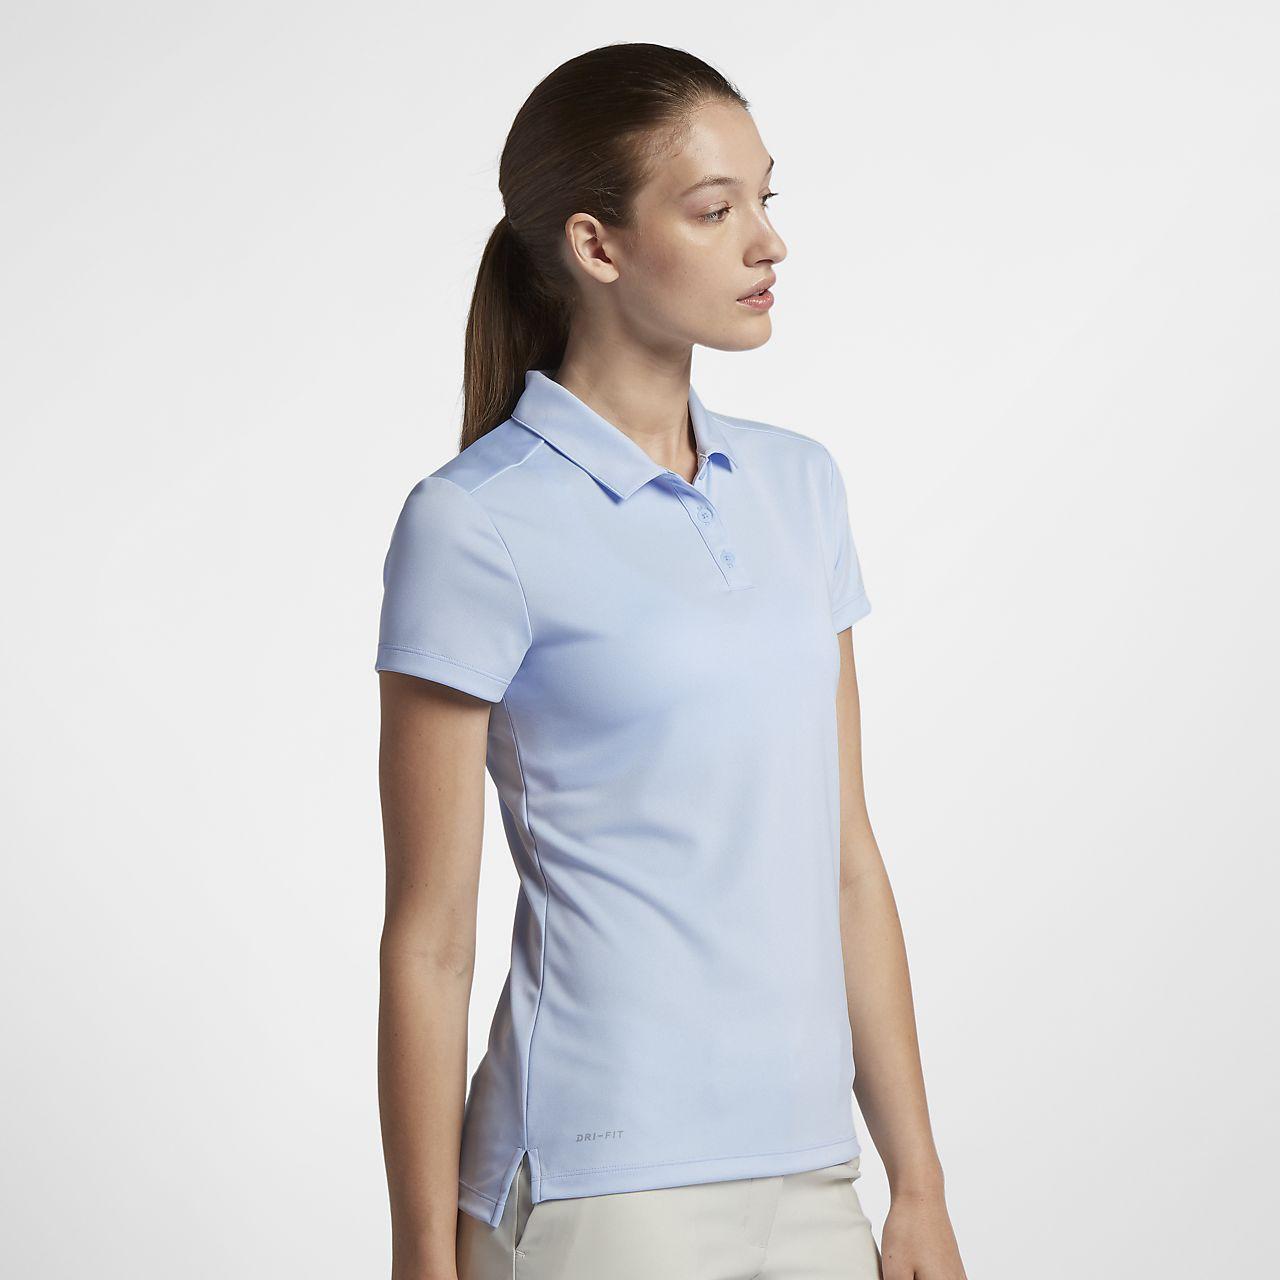 Ladies Sleeveless Golf Shirts Sale  f6aa7d842